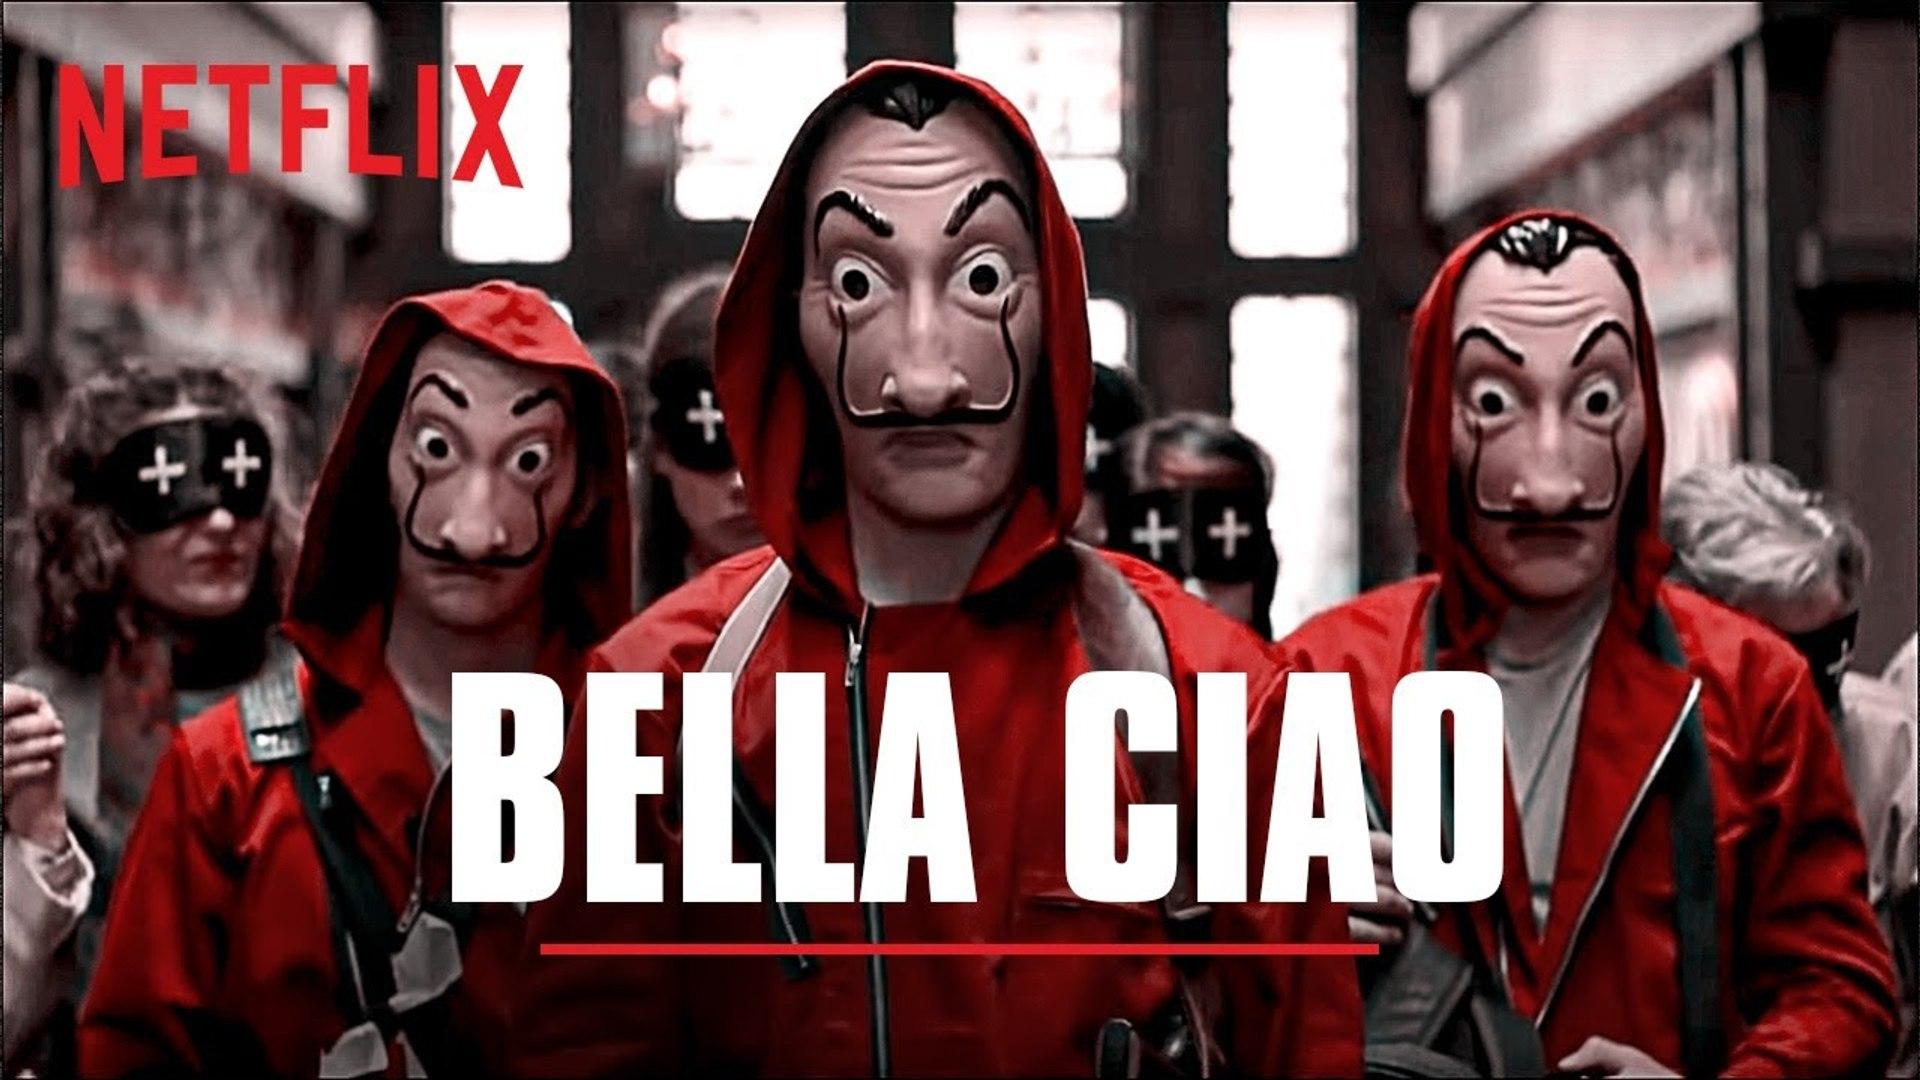 Bella Ciao song dance - La casa de papel - Money Heist -  Netflix